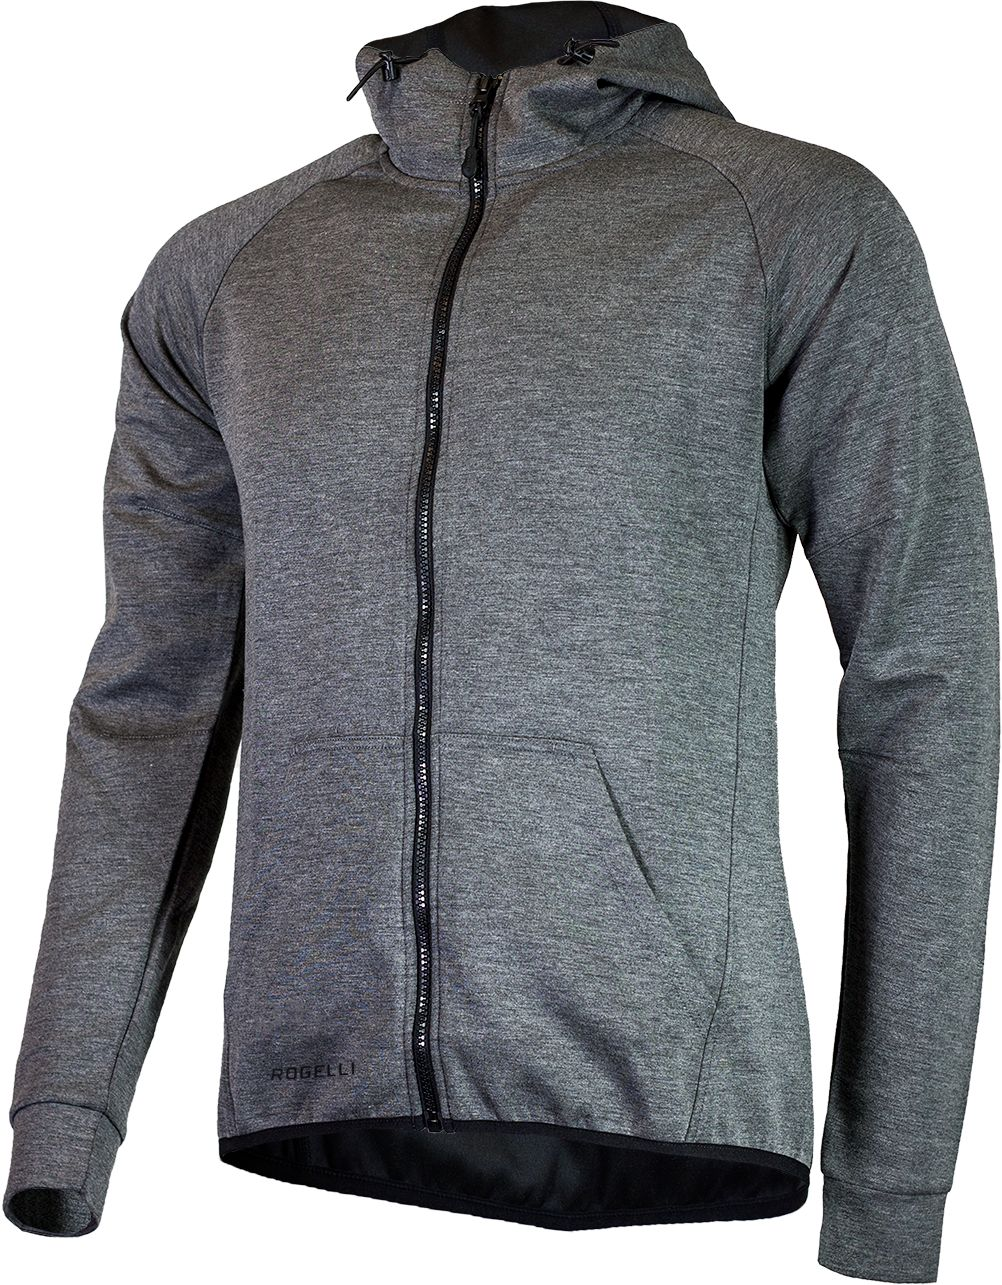 ROGELLI bluza męska z kapturem TRENING grey Rozmiar: M,050.600.XL